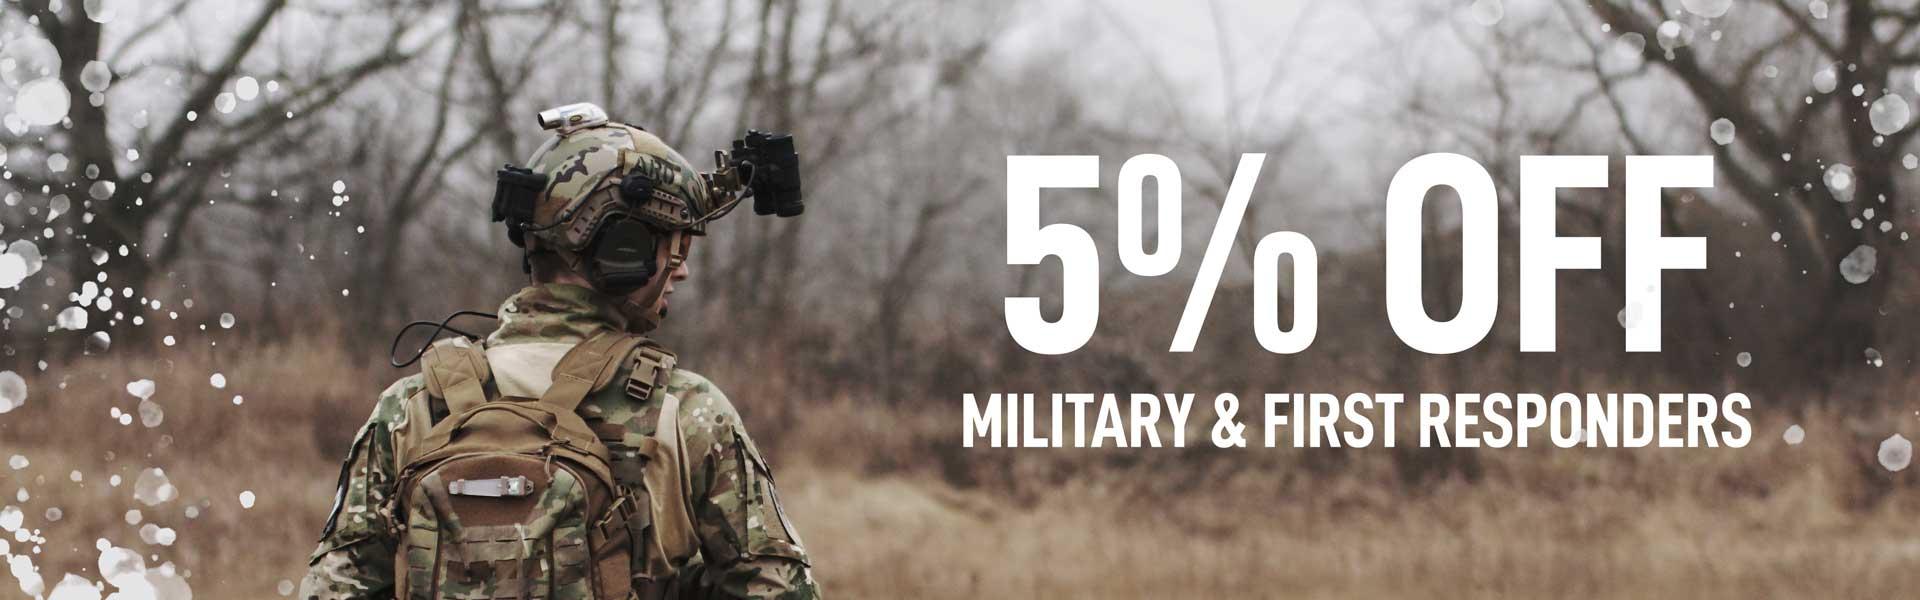 military-first-responder-discount-header-1.jpg